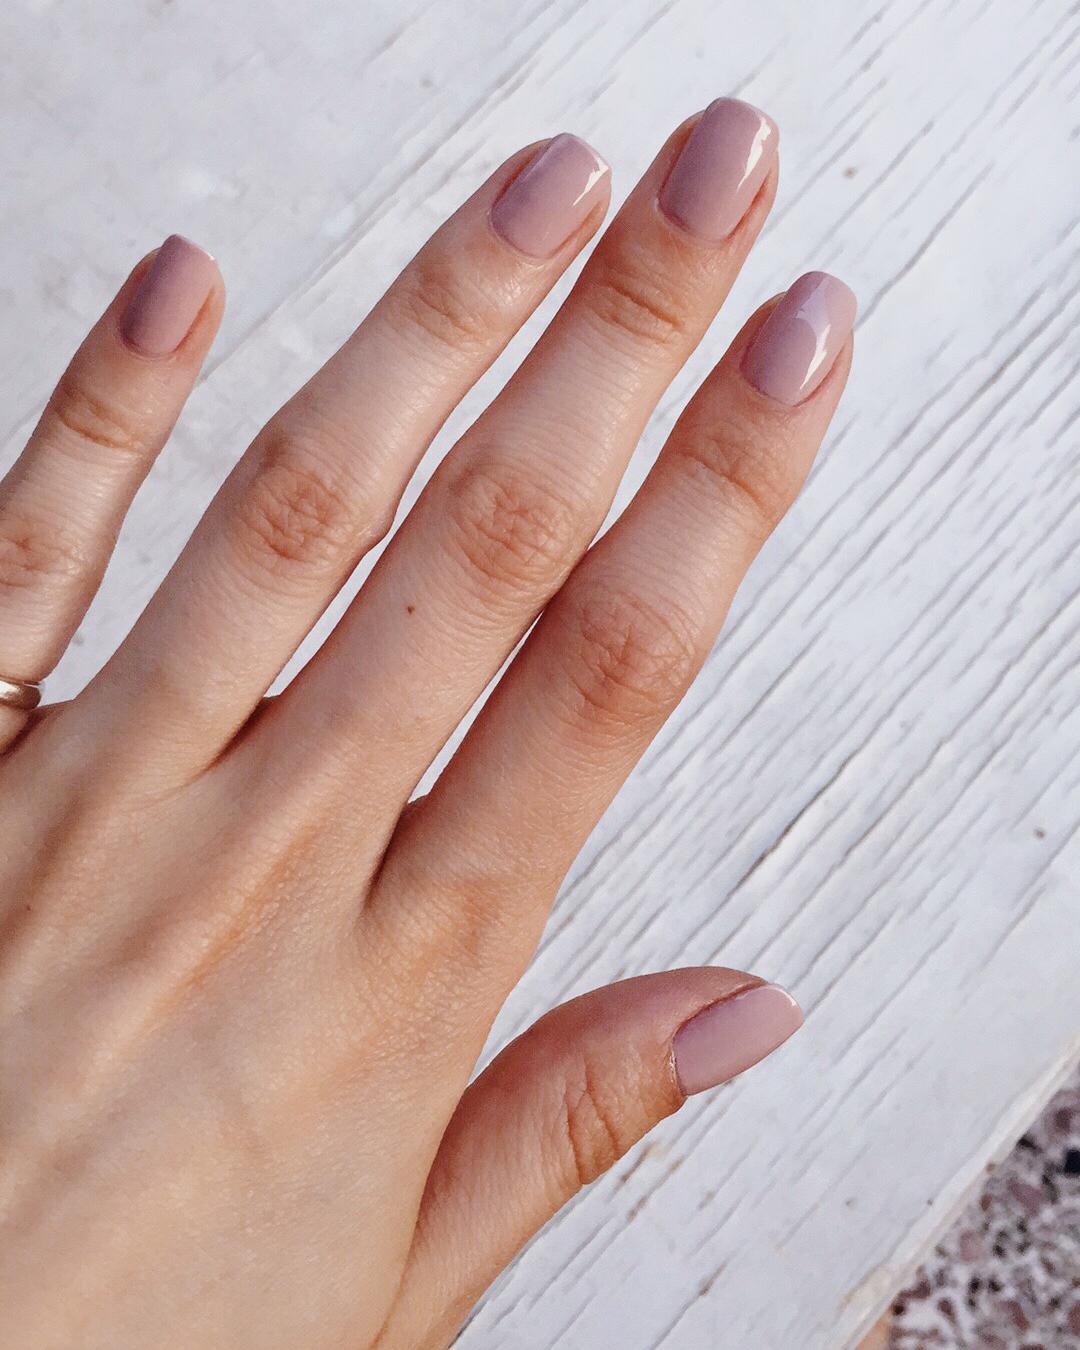 nude nail polish, jessica nail polish, jessica soar nail polish, manicure, mani inspo, nail inspiration